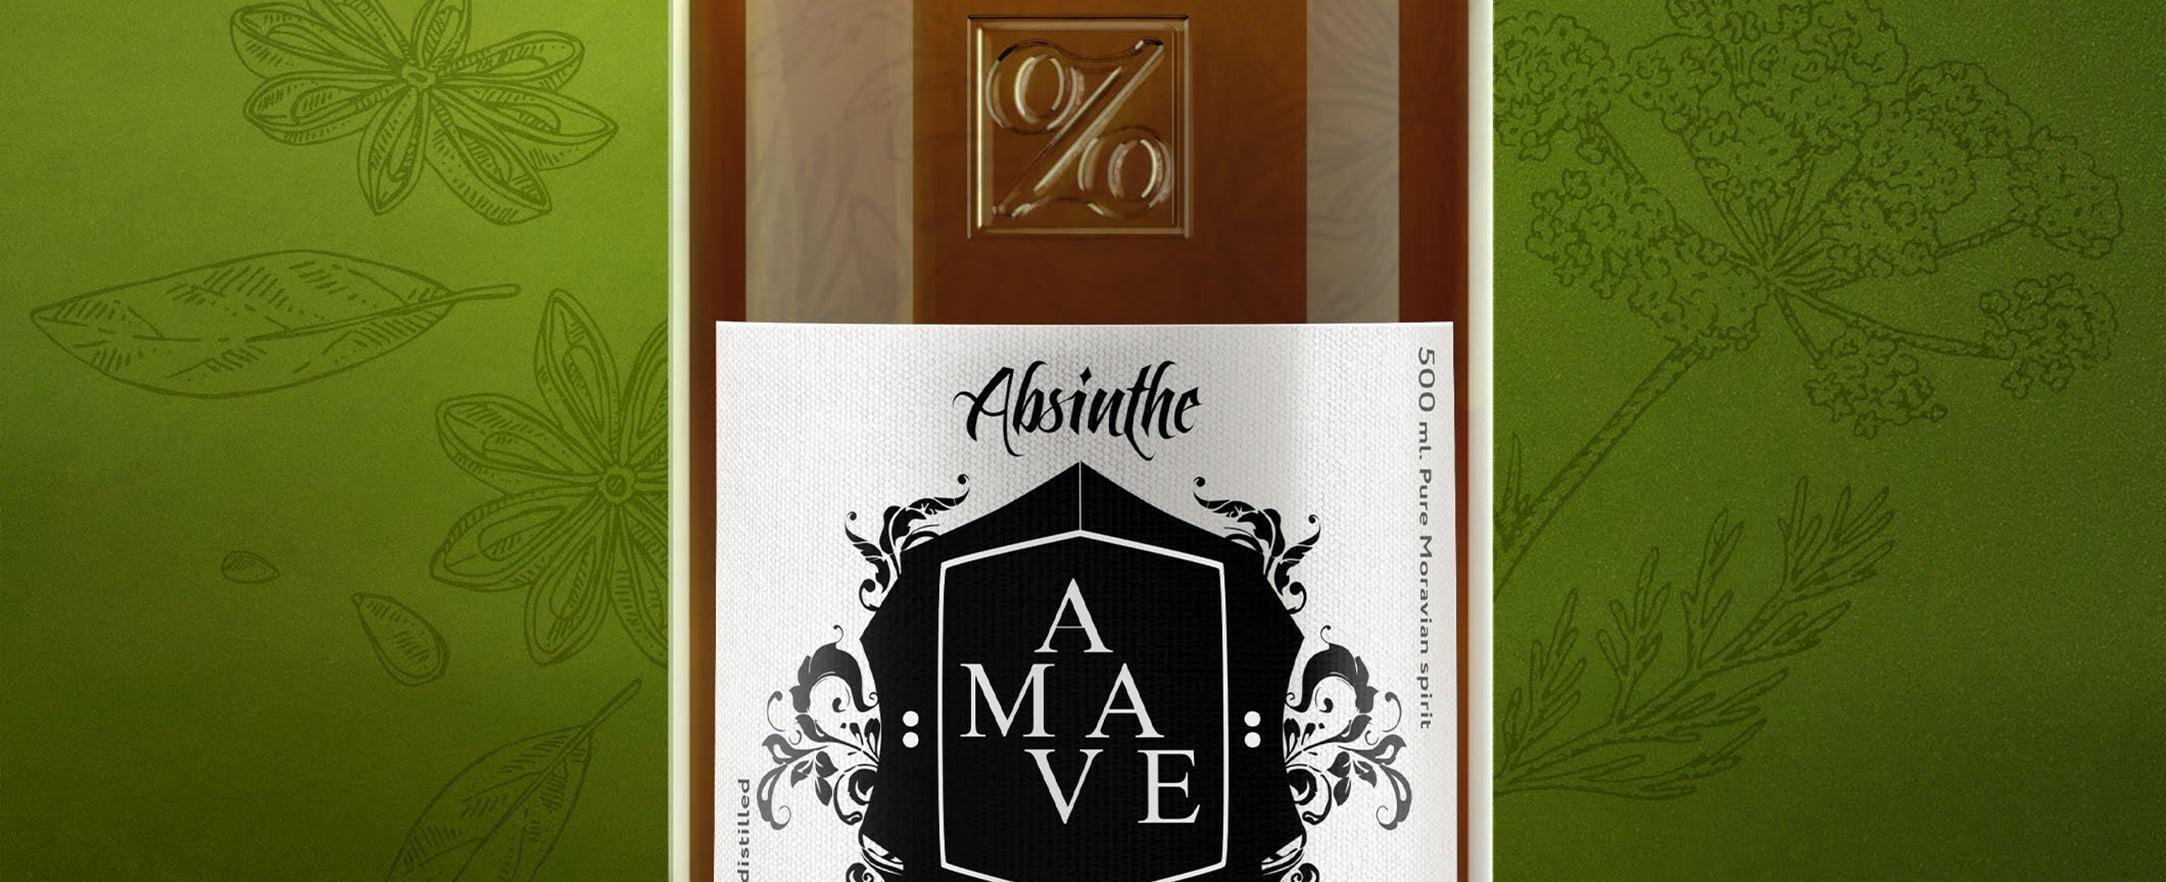 Amave Absinthe